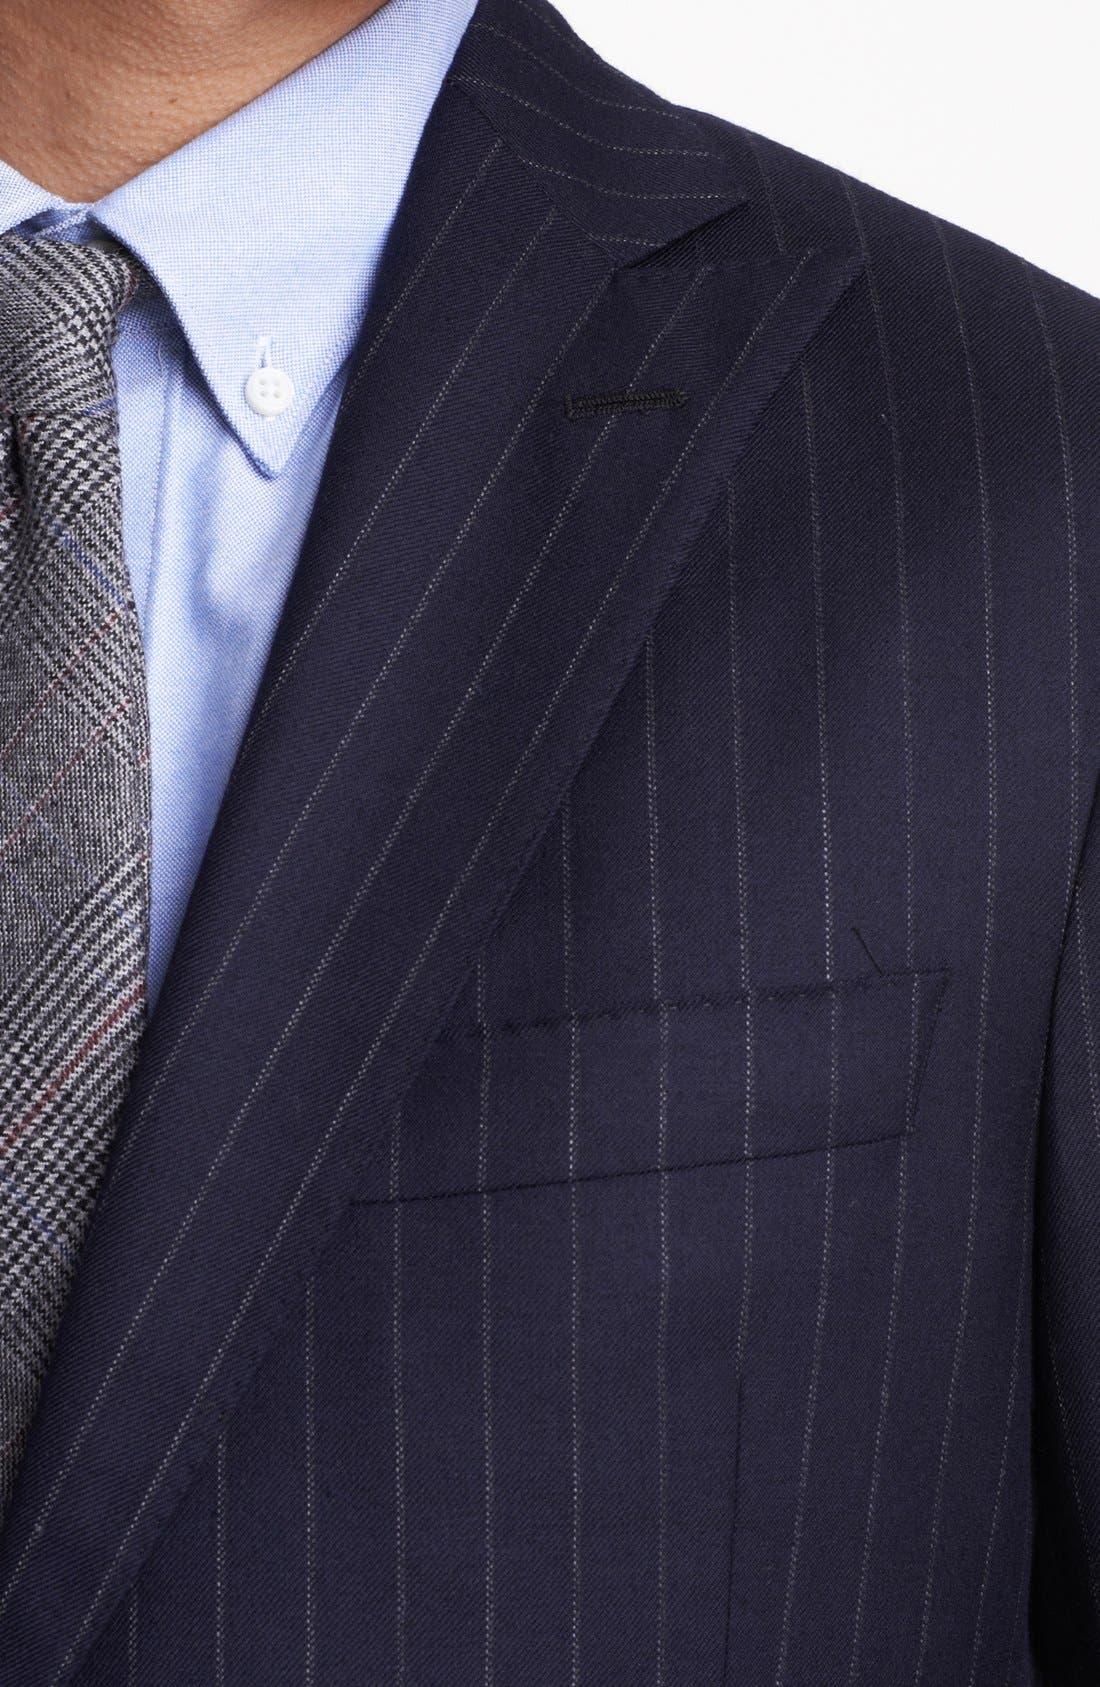 Alternate Image 2  - Todd Snyder Navy Pinstripe Wool Suit